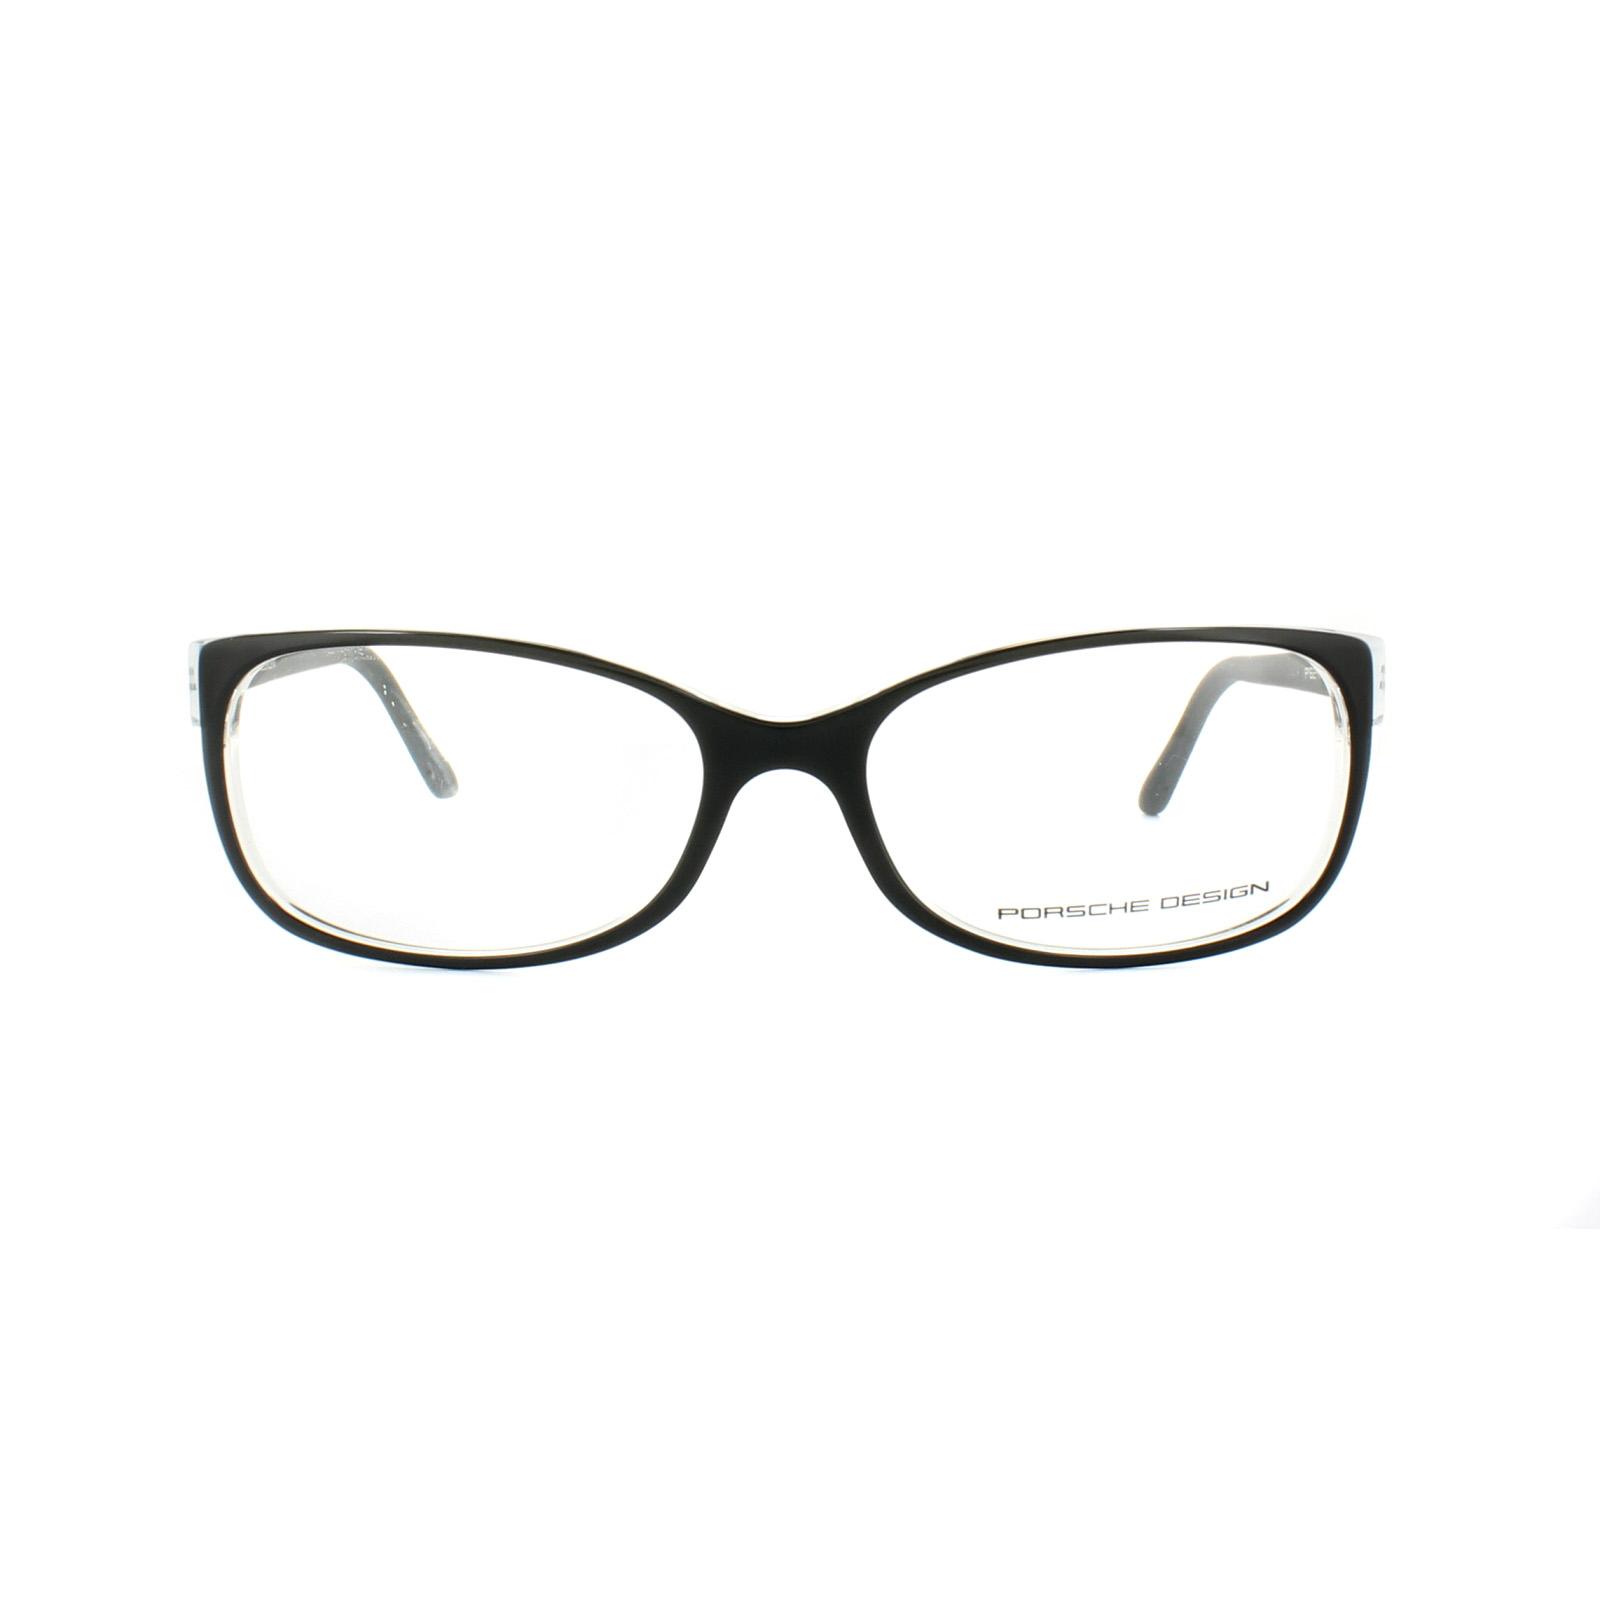 Cheap Porsche Design P8247 Glasses Frames - Discounted ...